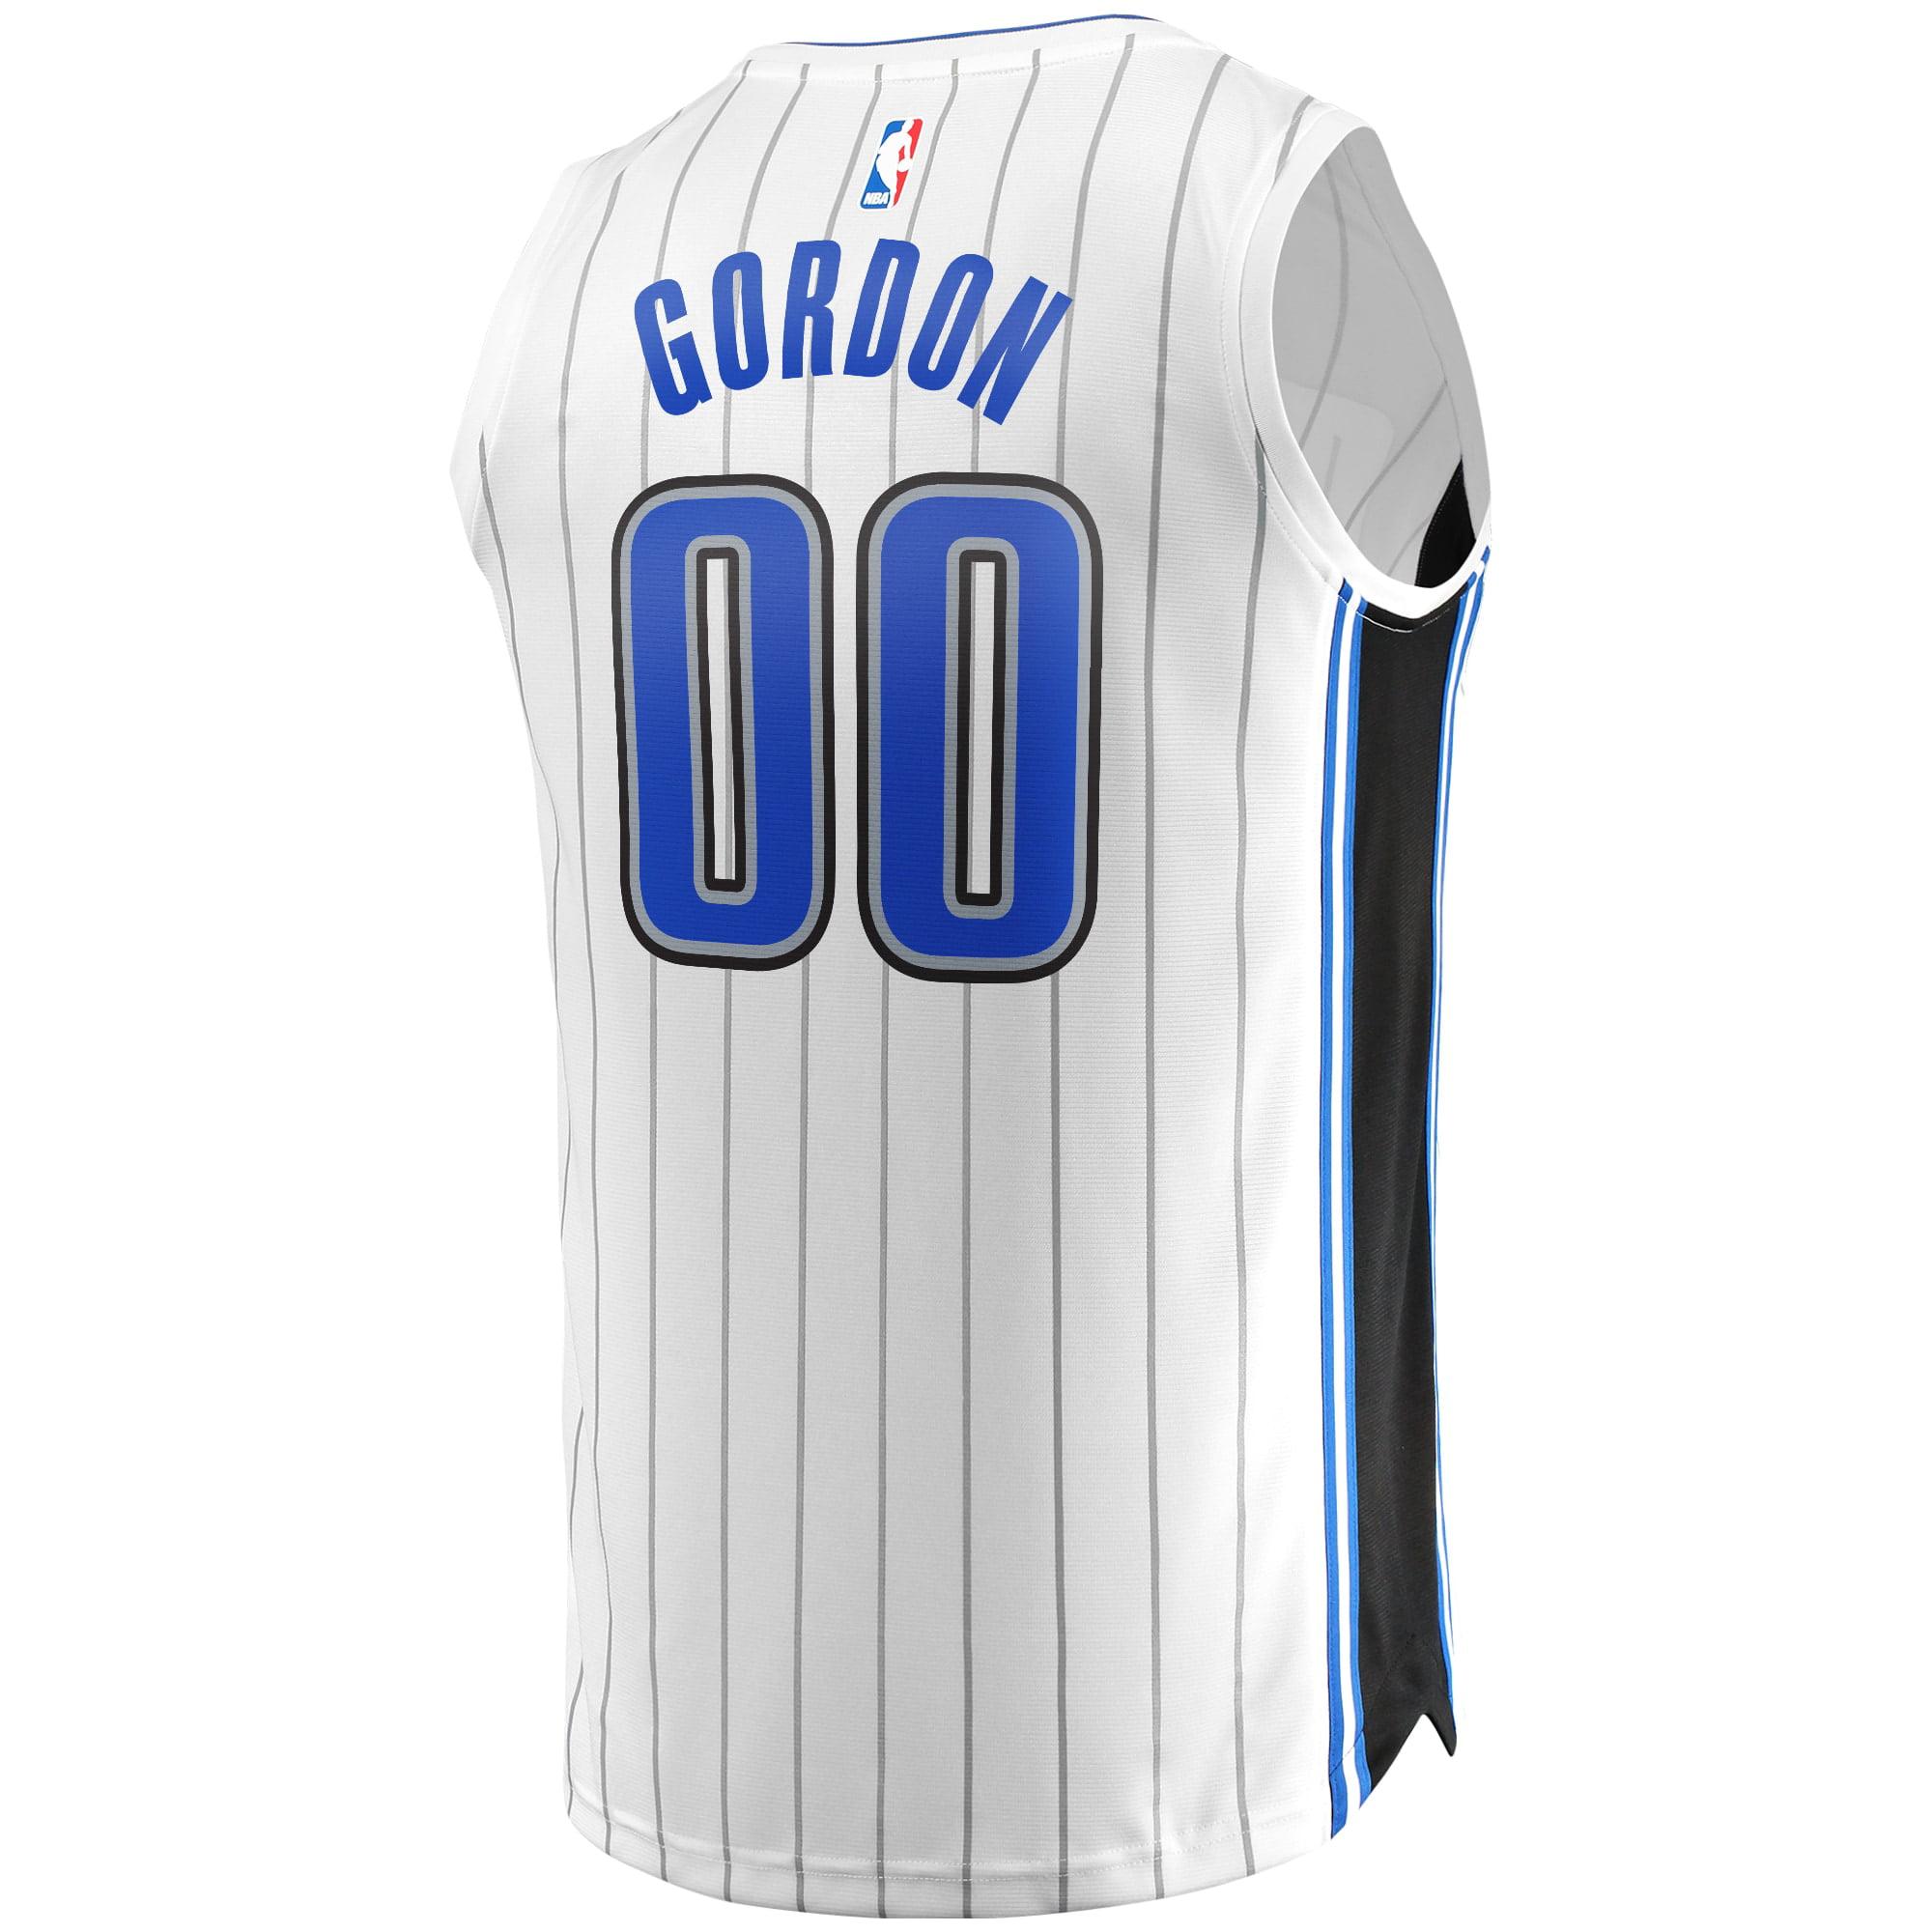 Aaron Gordon Orlando Magic Fanatics Branded Youth Fast Break Replica Player Jersey - Association Edition - White